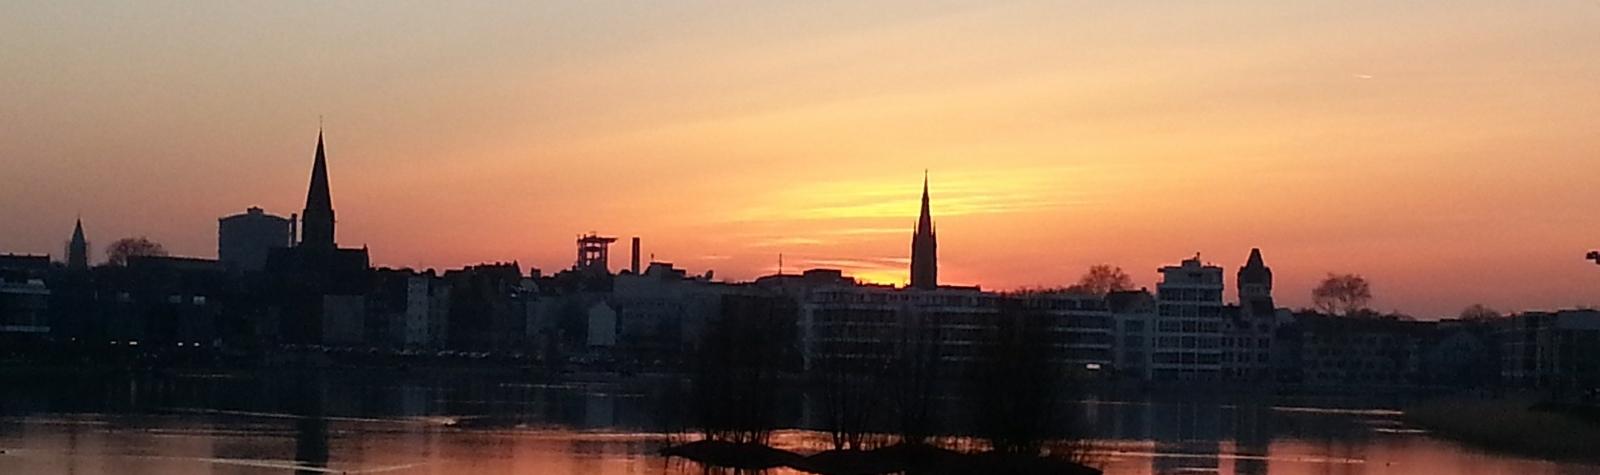 Blog aus Dortmund